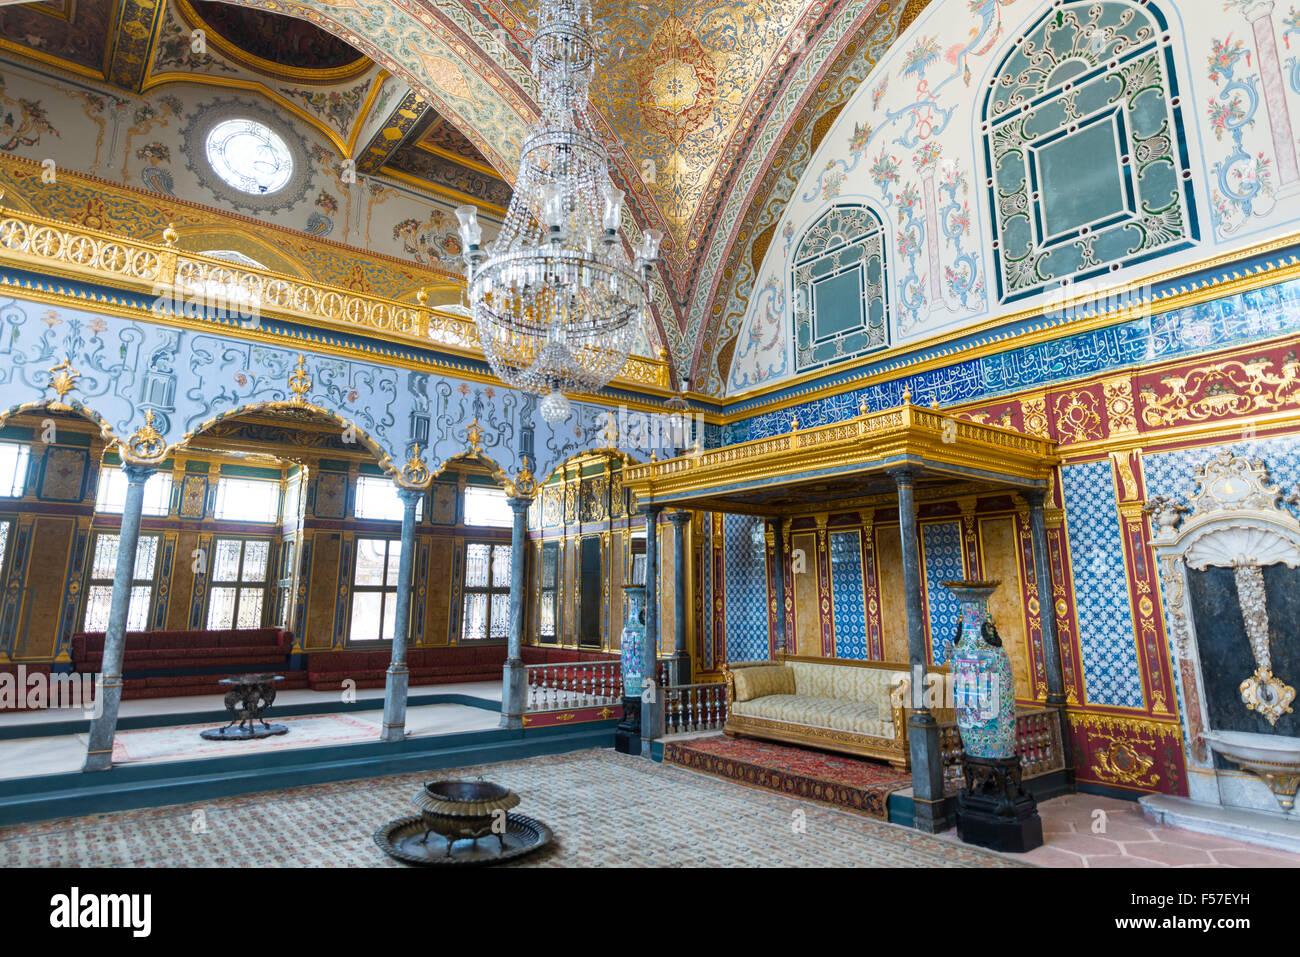 Imperial Hall, Hünkar Sofas, ceremonial room in the Topkapi Palace, Istanbul, Turkey - Stock Image